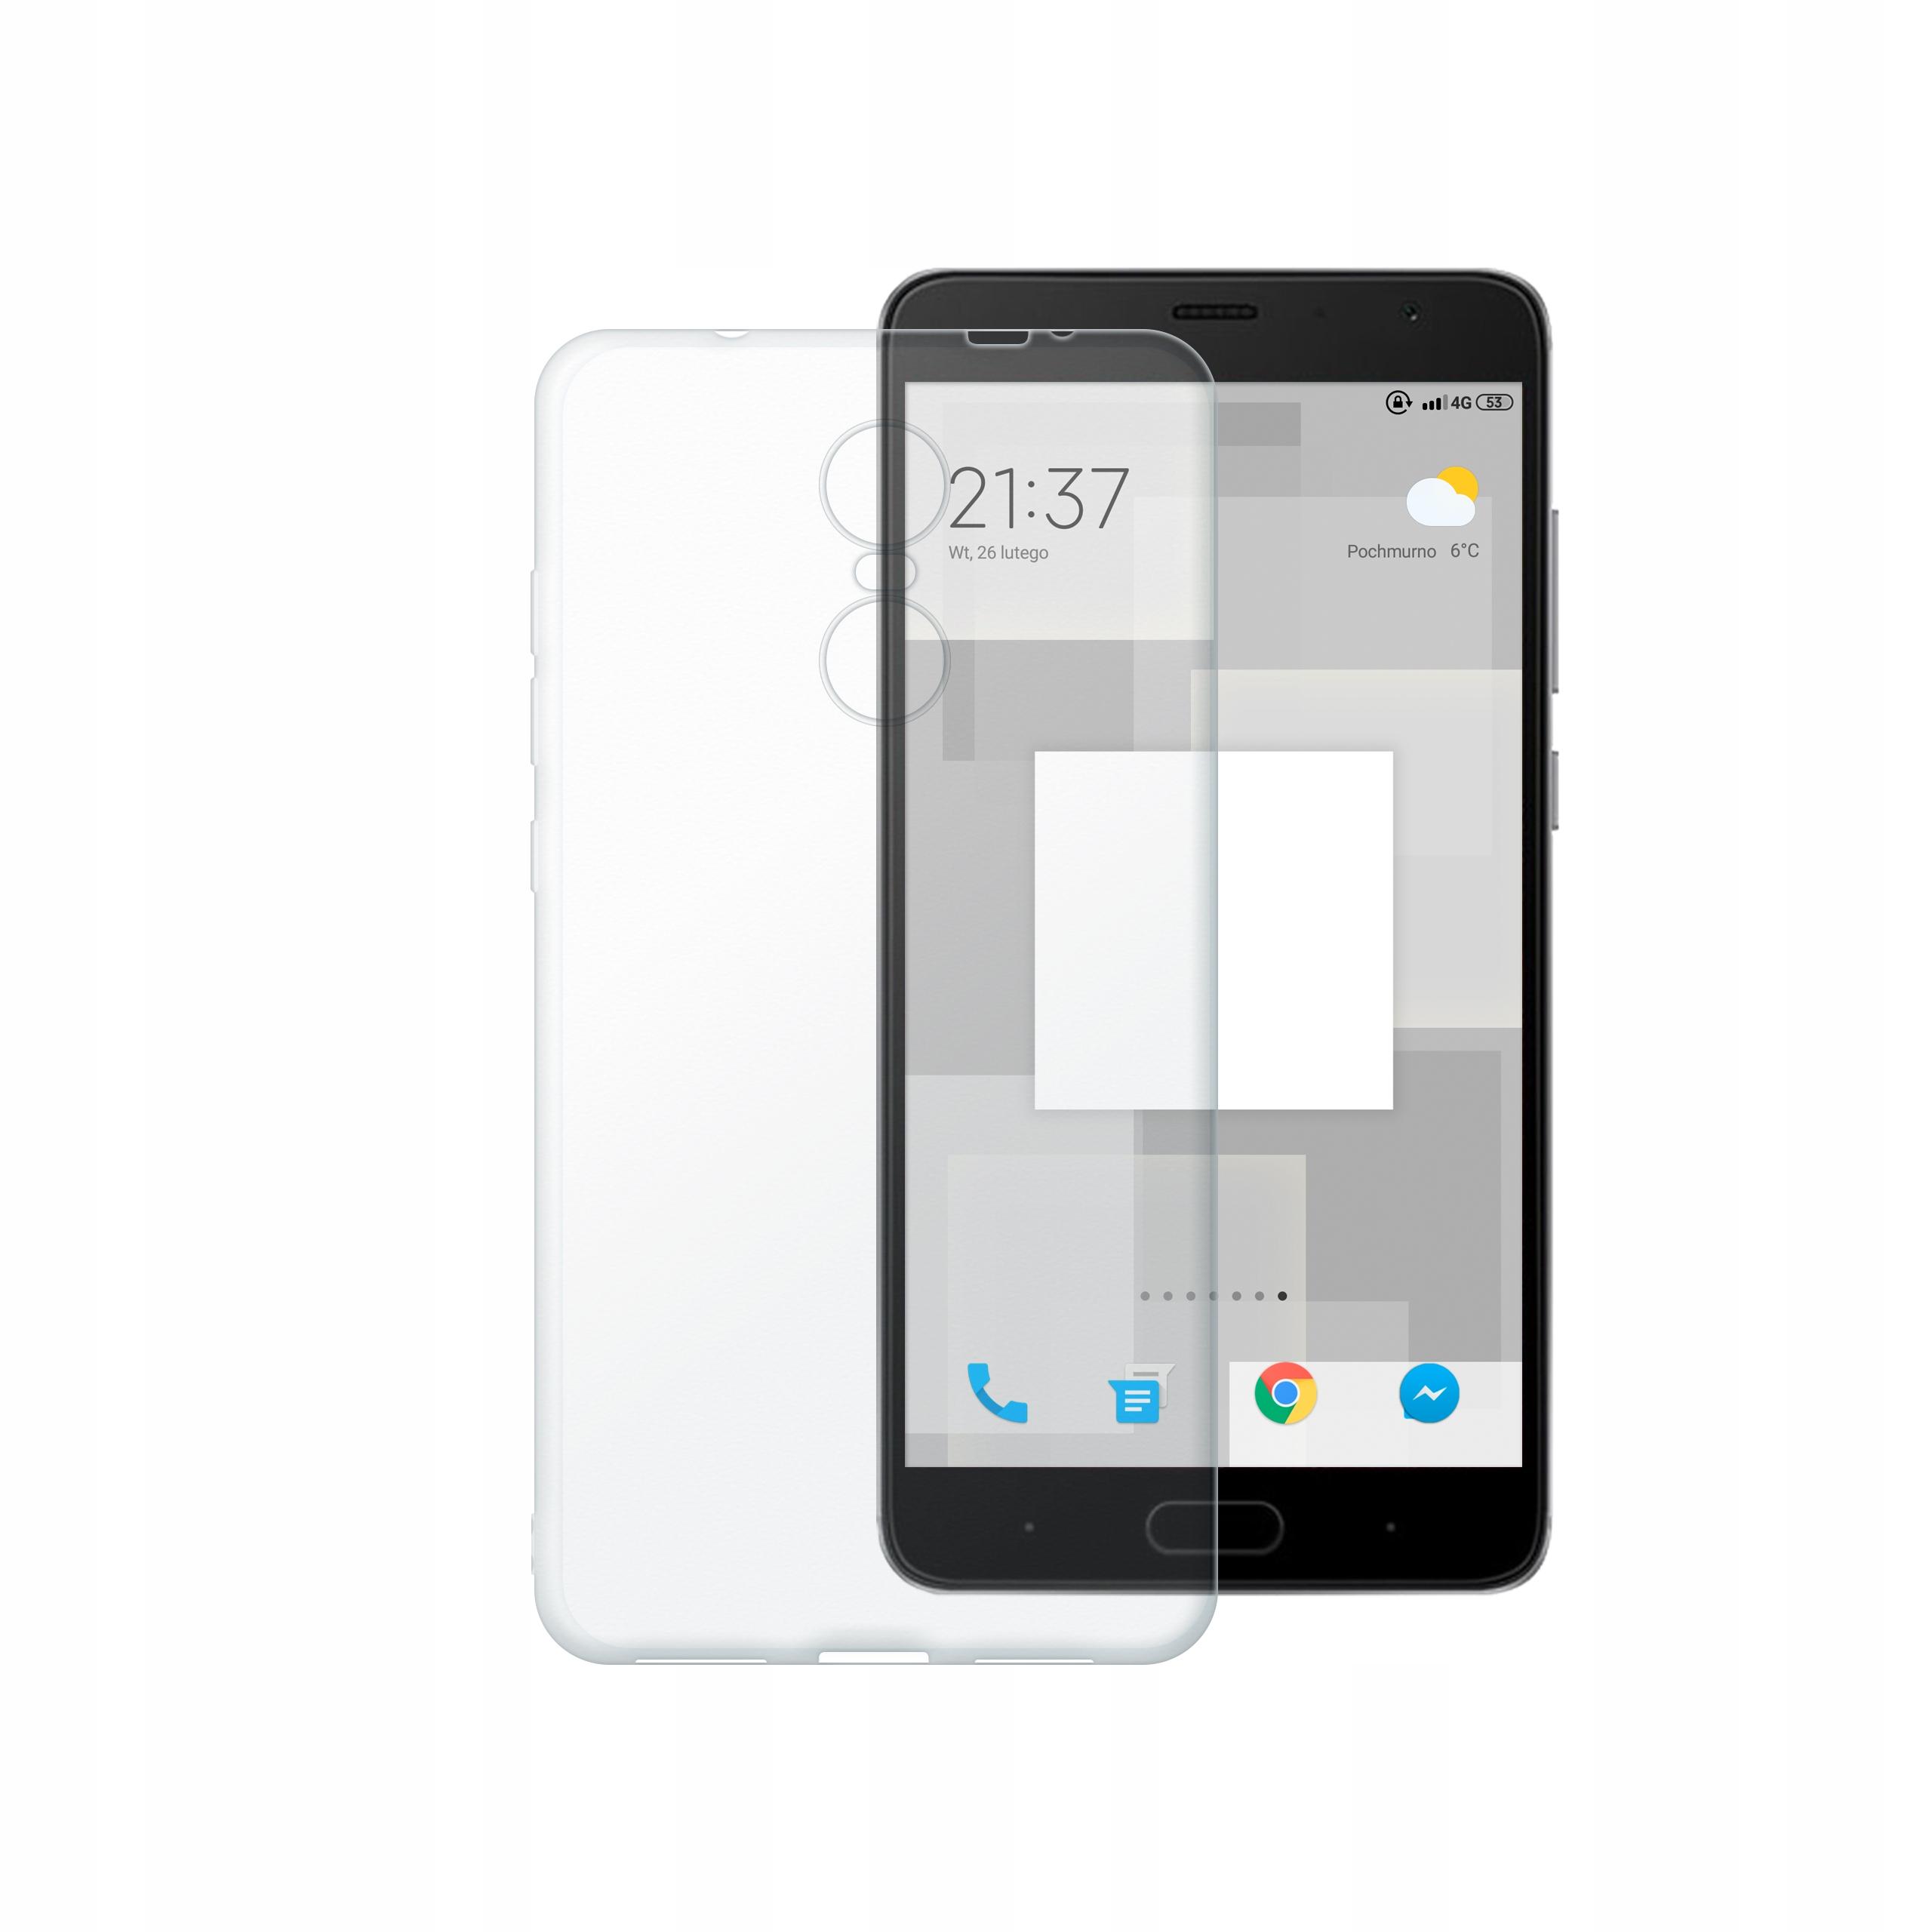 Etui silikonowe Polski Banan do Xiaomi Redmi Pro